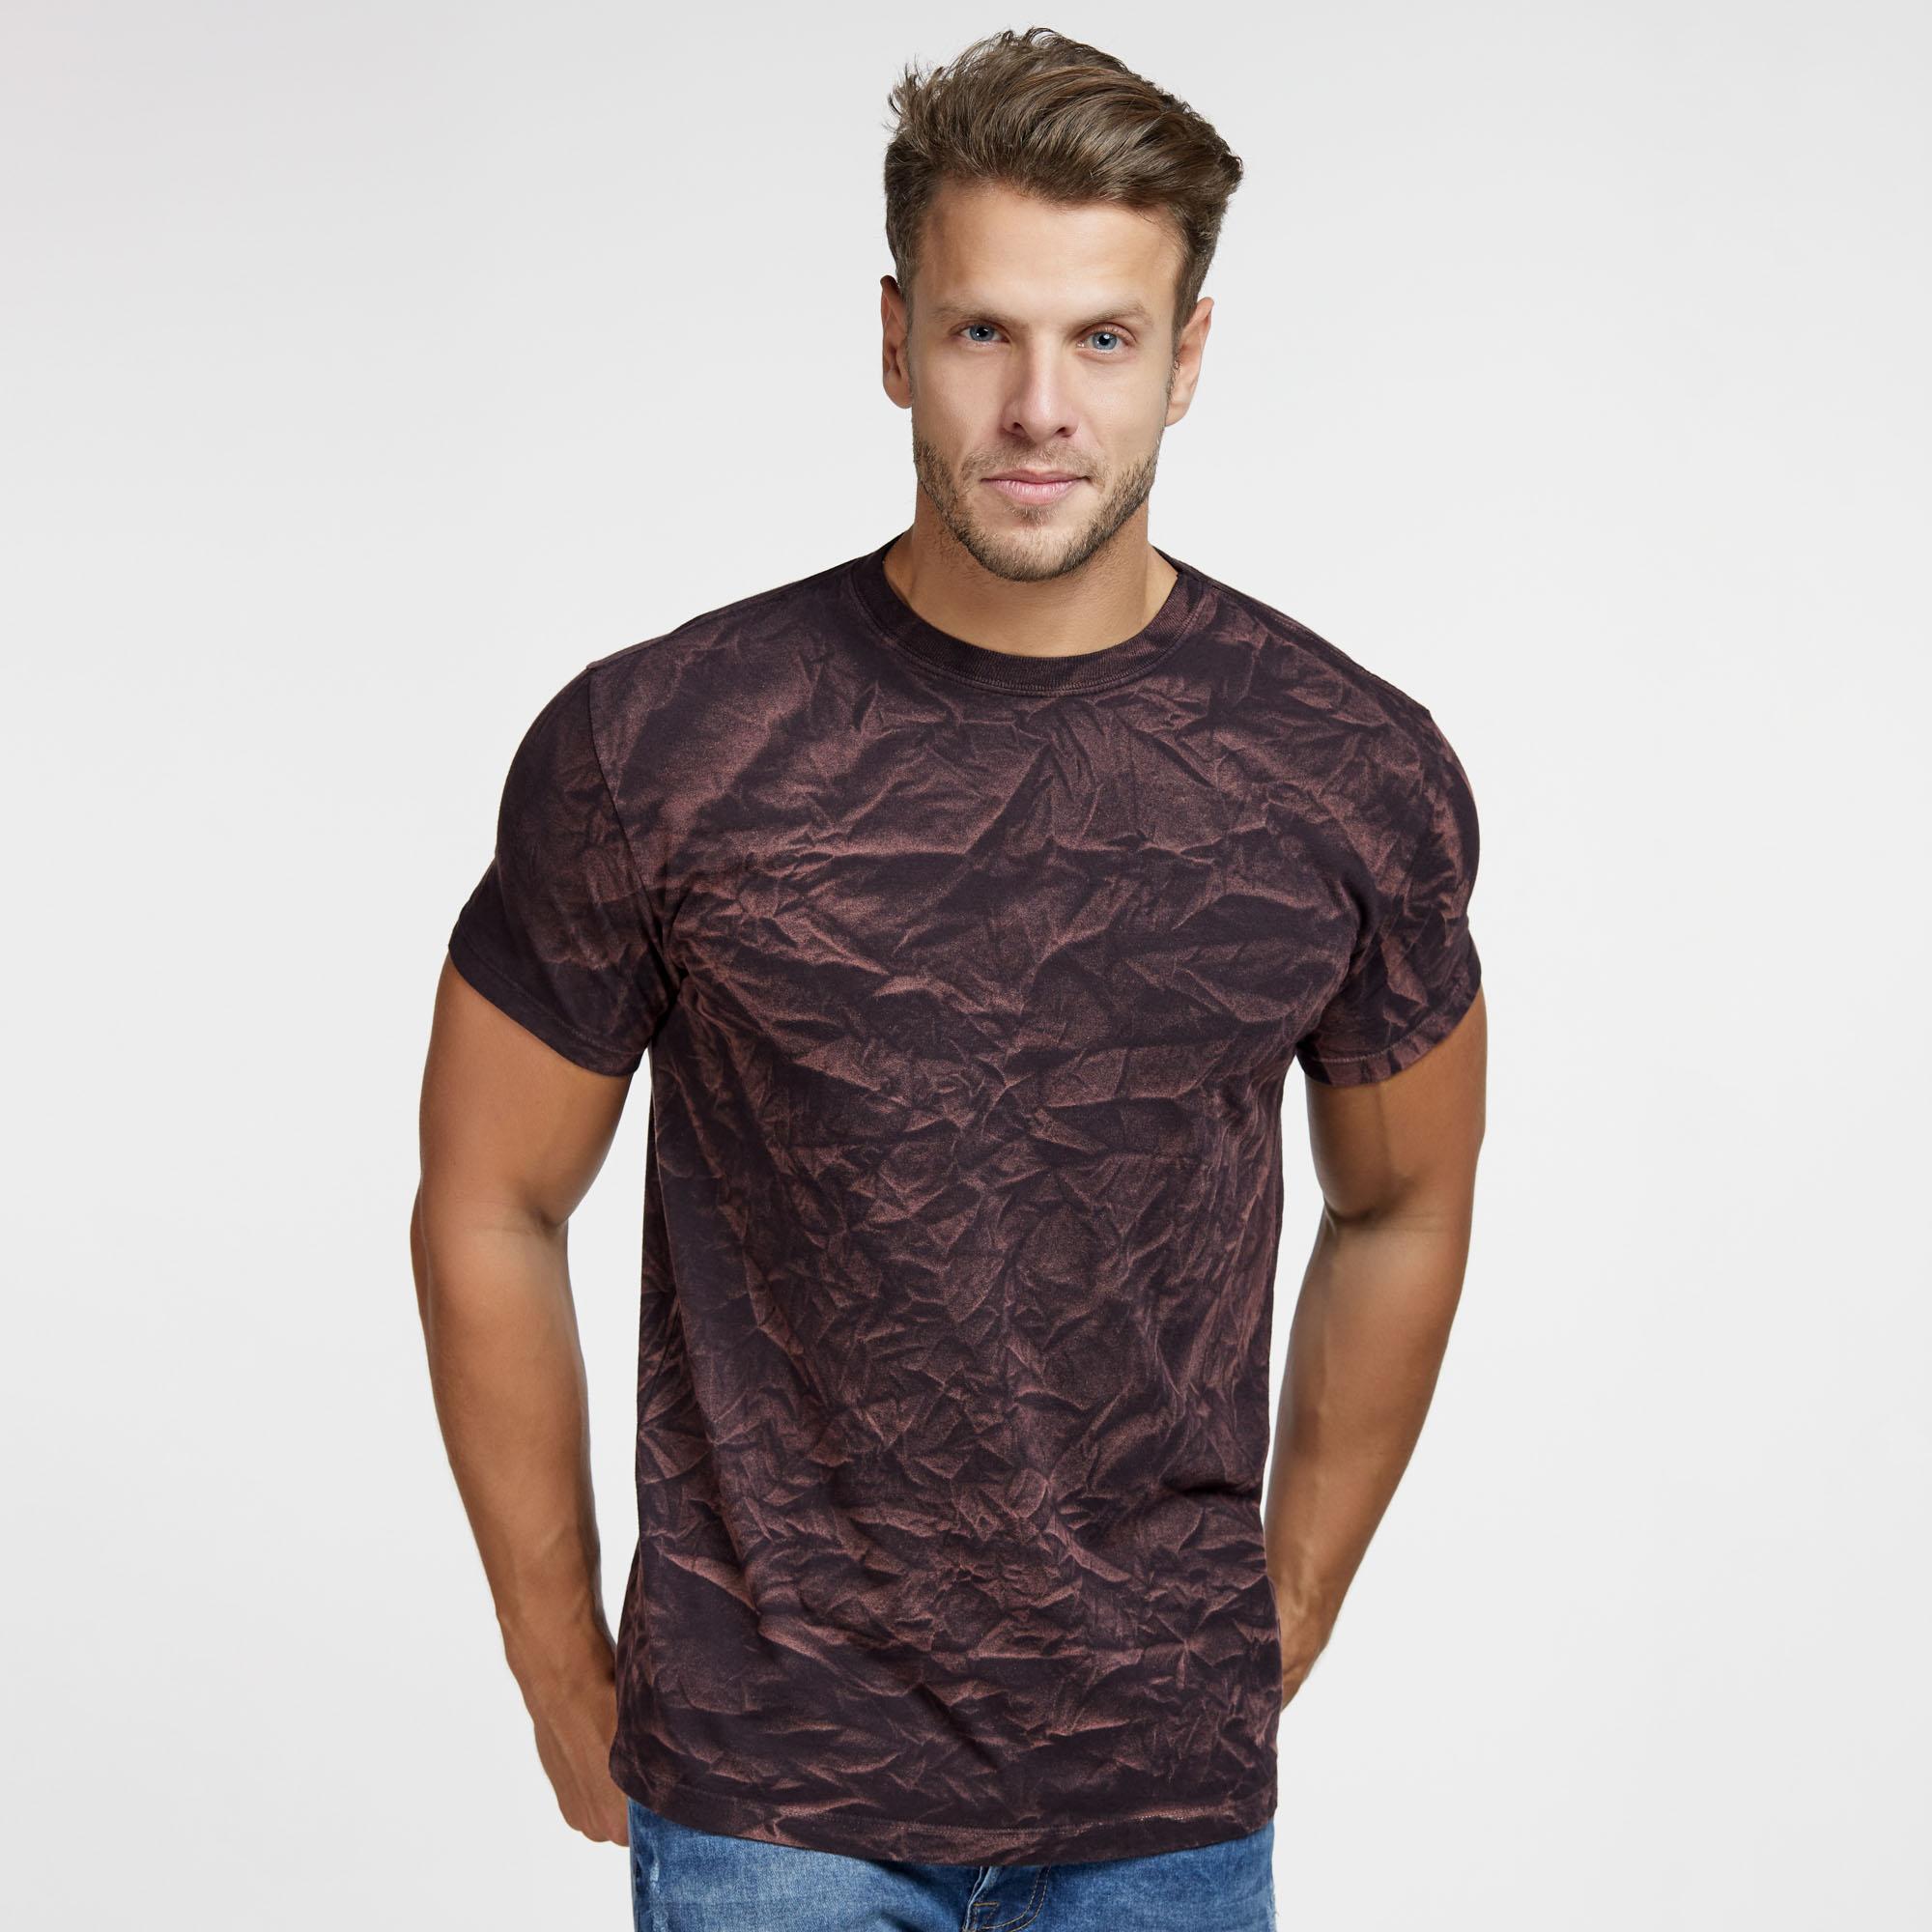 Camiseta Masculina 3D Bordo